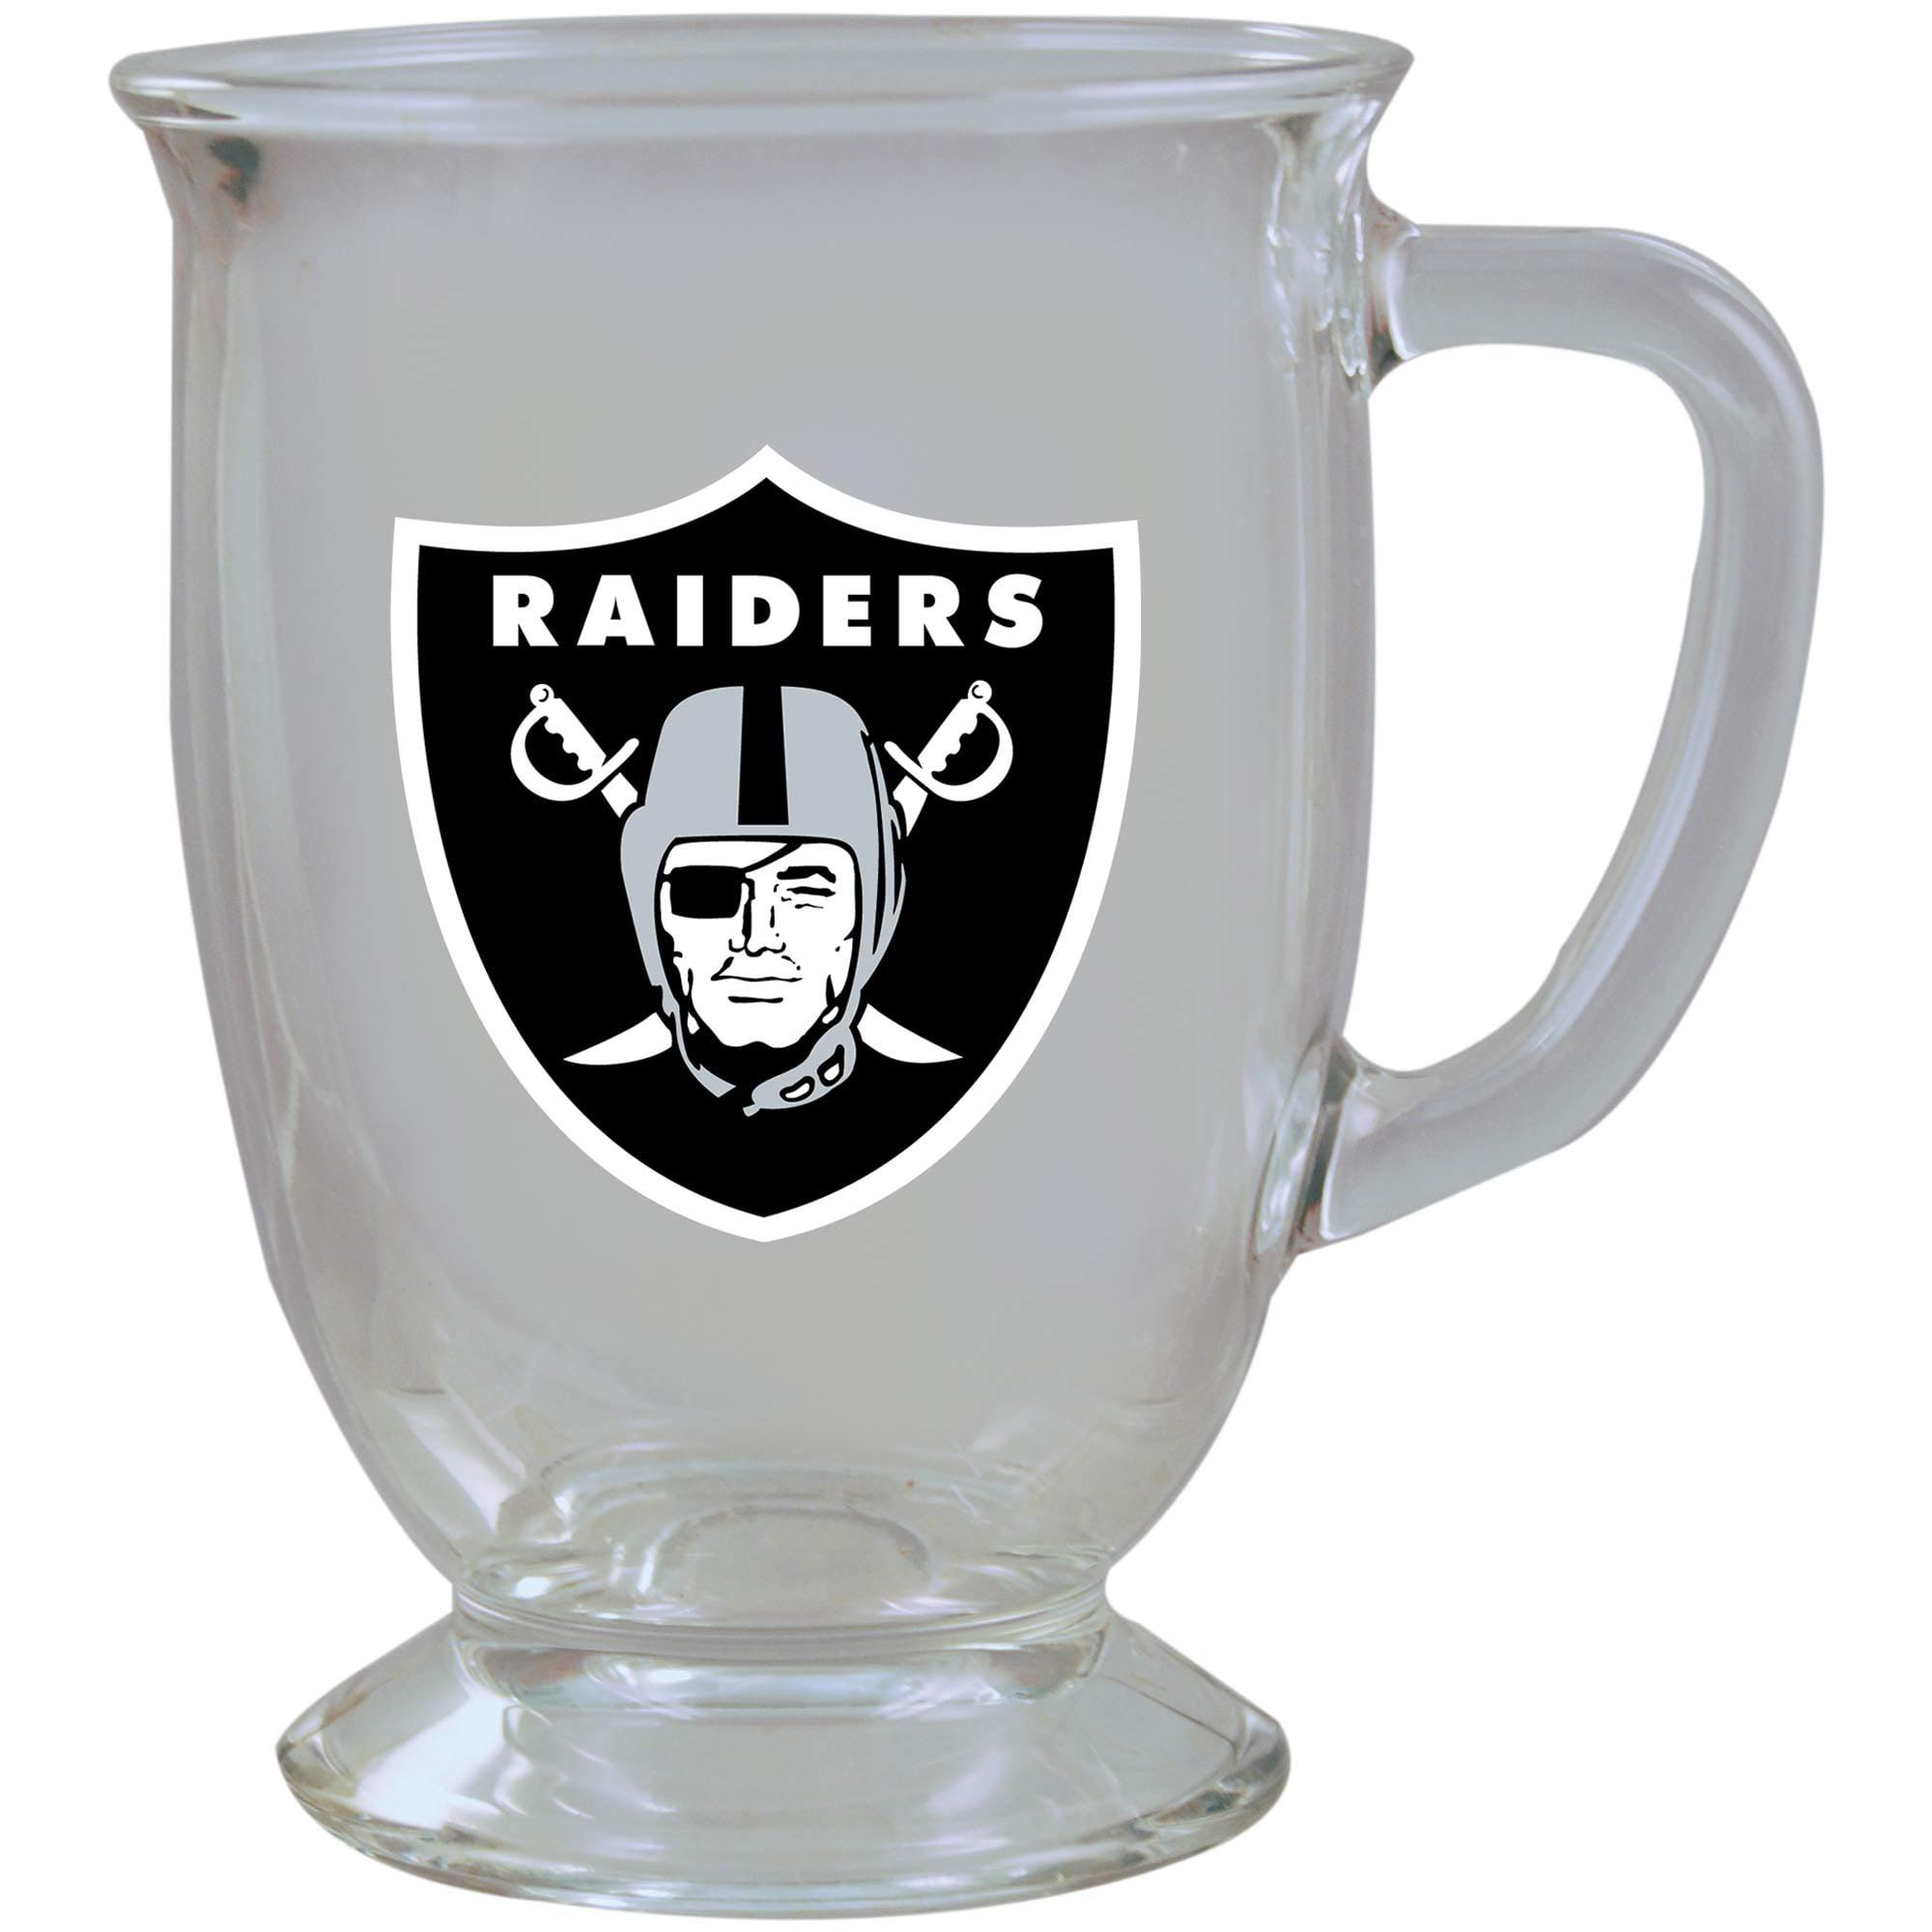 Oakland Raiders 16oz. Kona Glass Mug - No Size